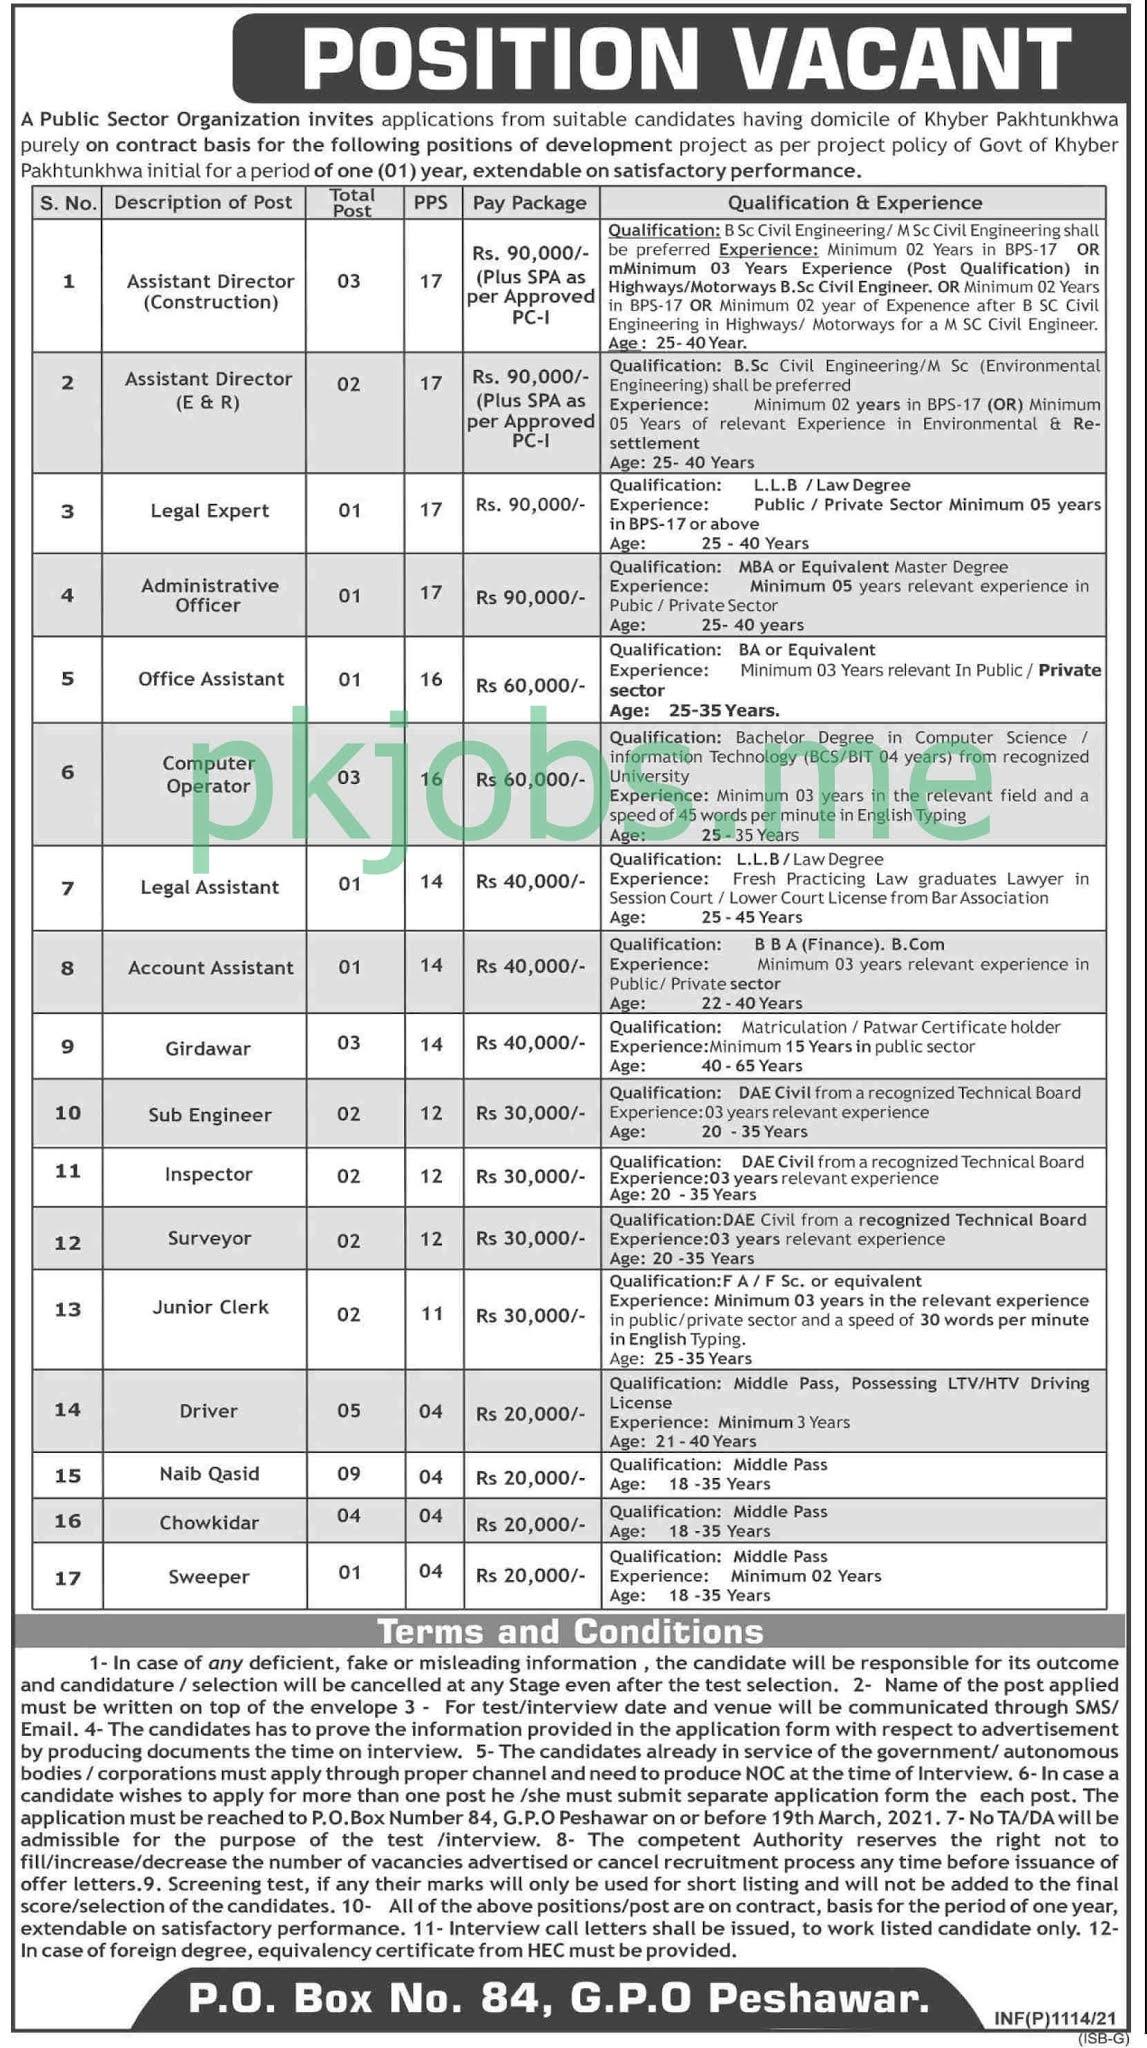 Latest PO Box 84 Peshawar Management Posts 2021